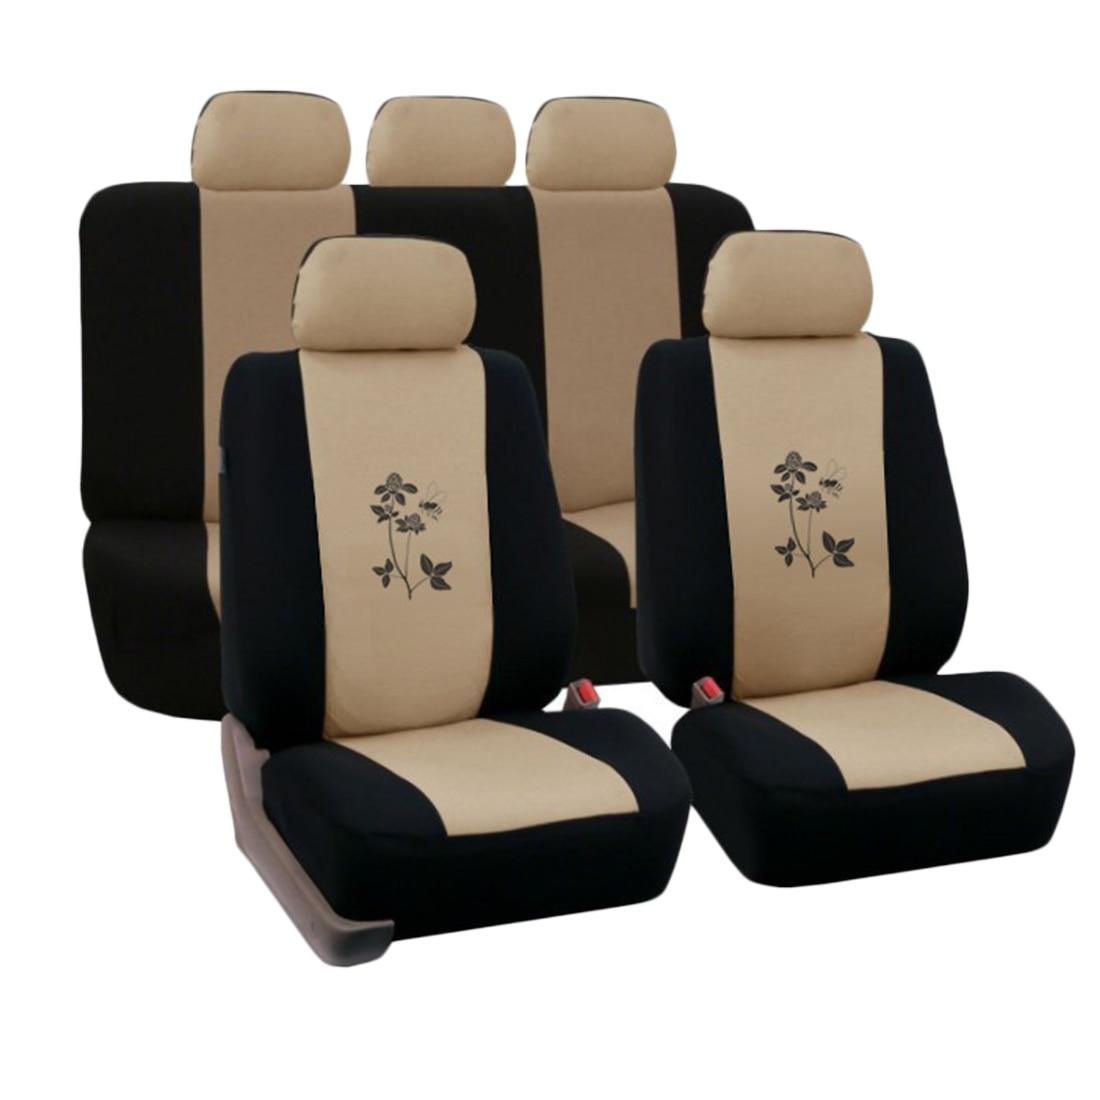 Dewtreelita Universal Car Seat Protector Printing Auto Seat Cover font b Interior b font Accessories Blue